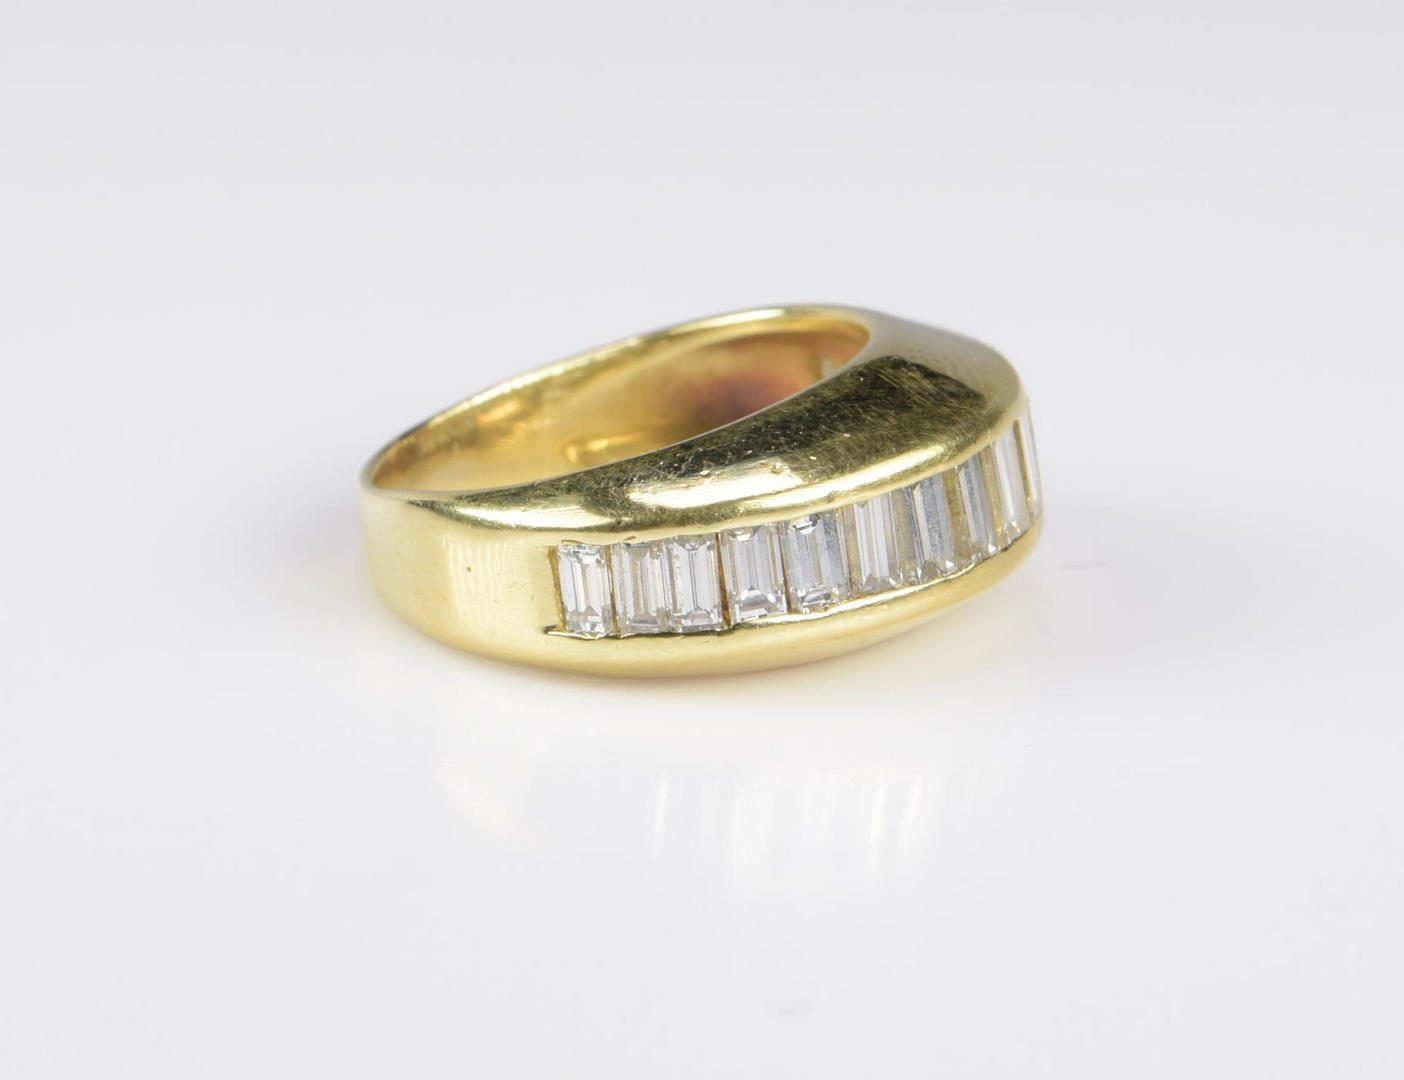 Lot 12: 18K Diamond Baguette Dome Ring